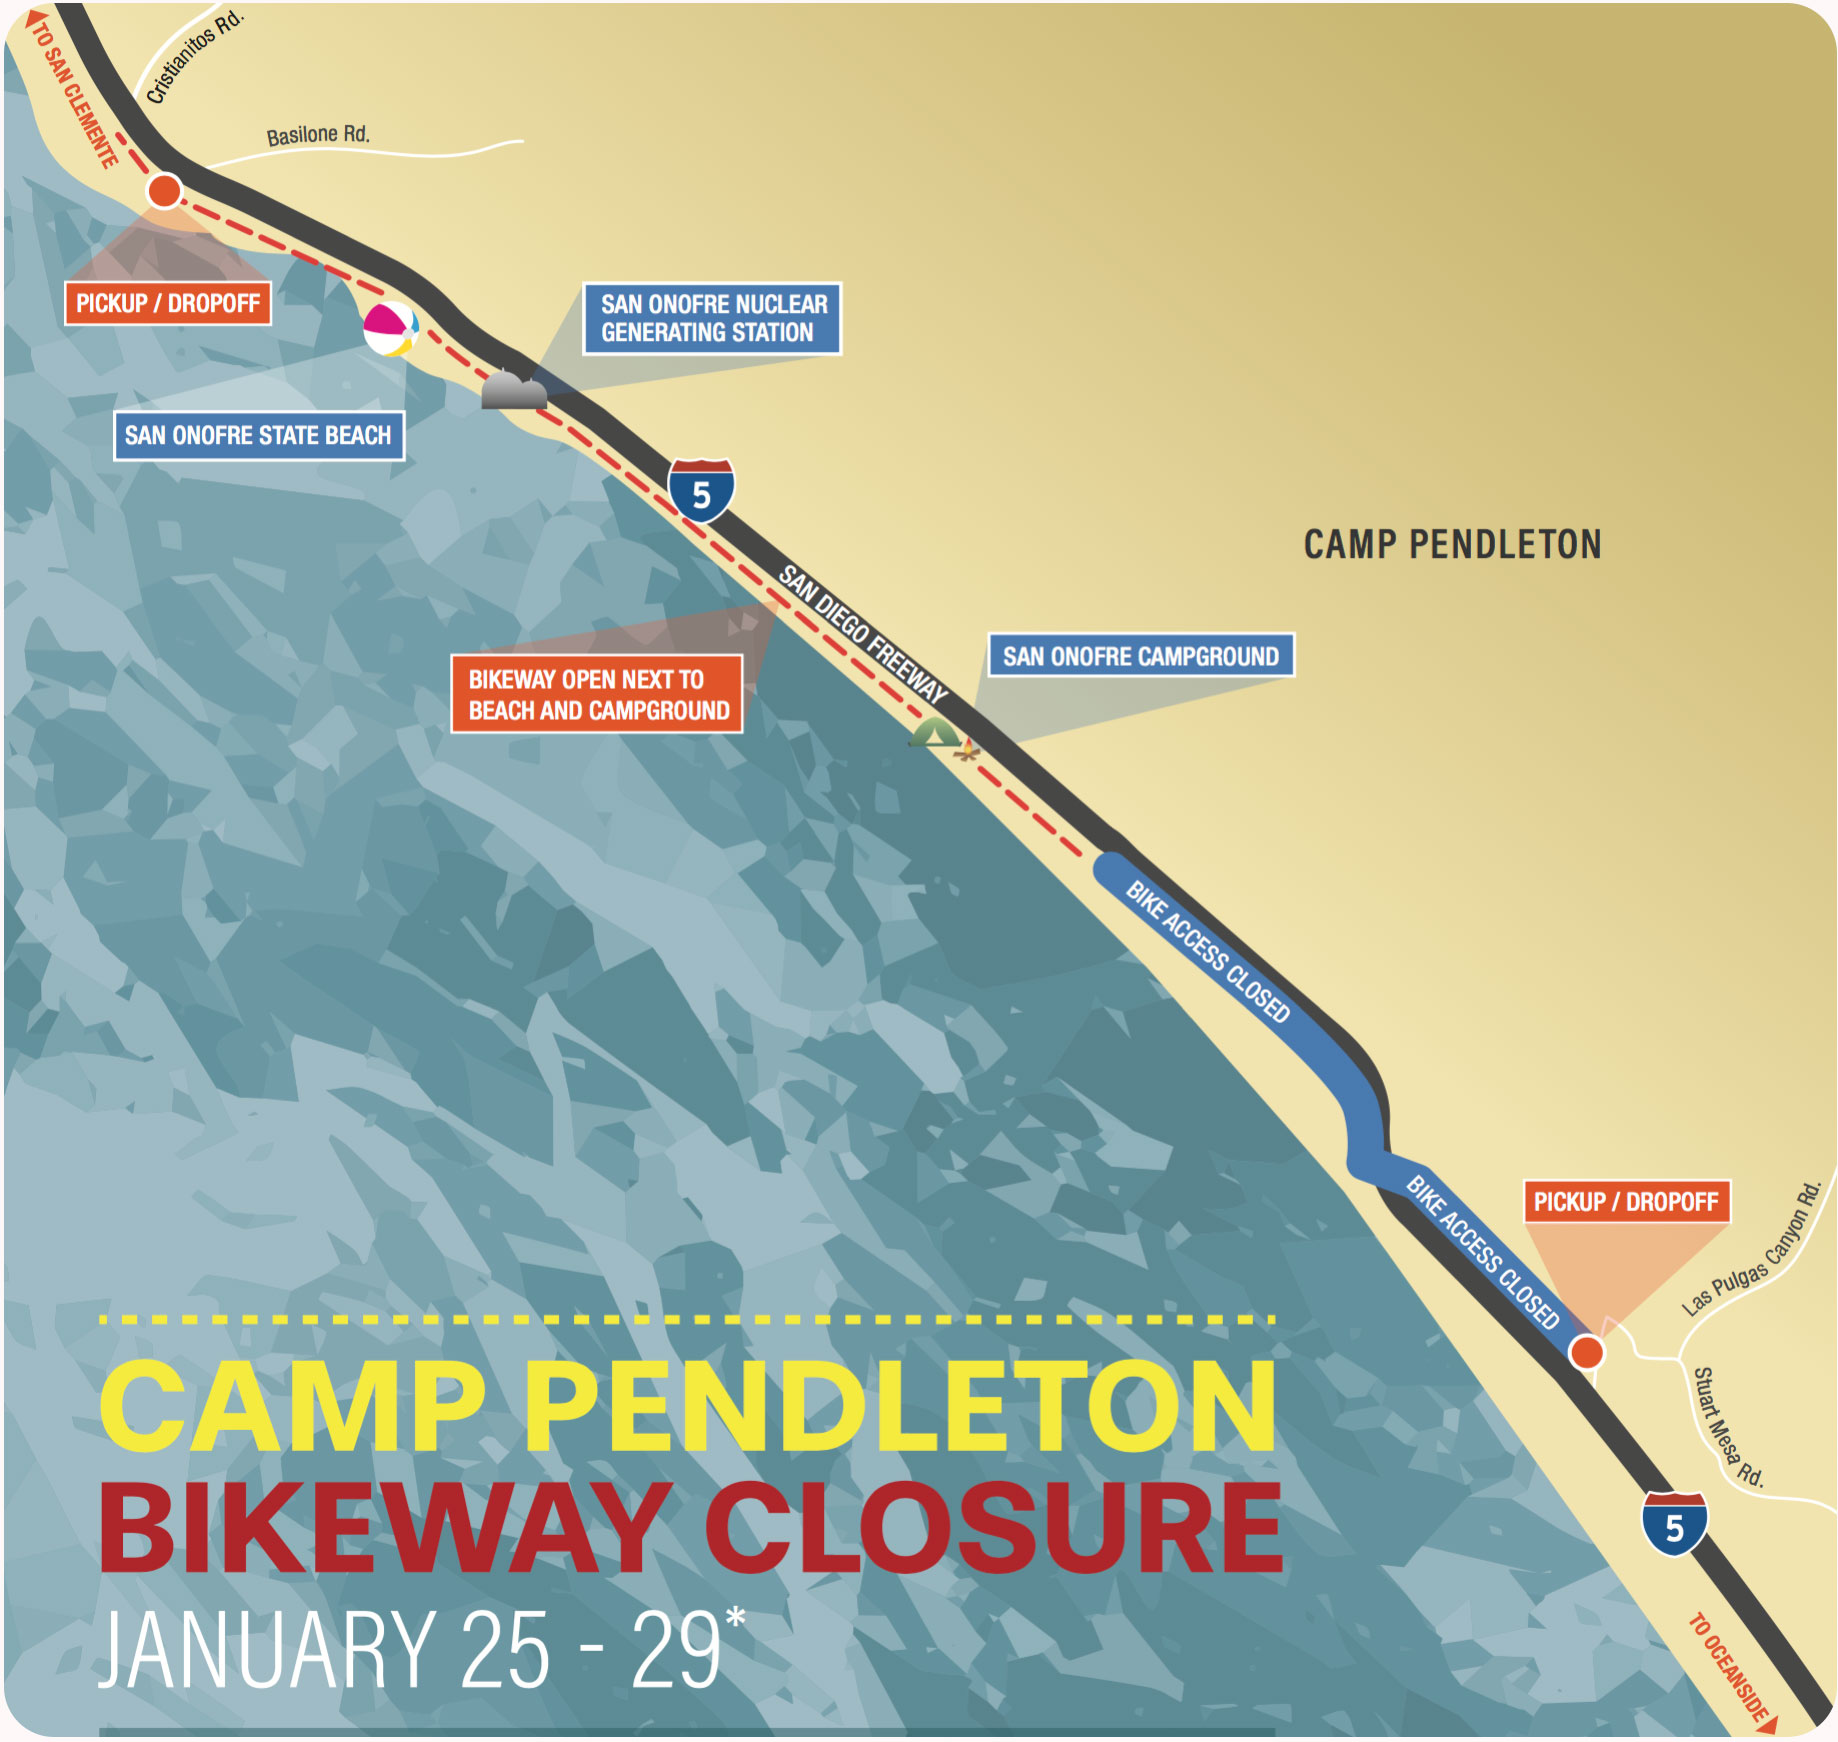 Camp Pendleton Archives - BikinginLA 46e60bdb5